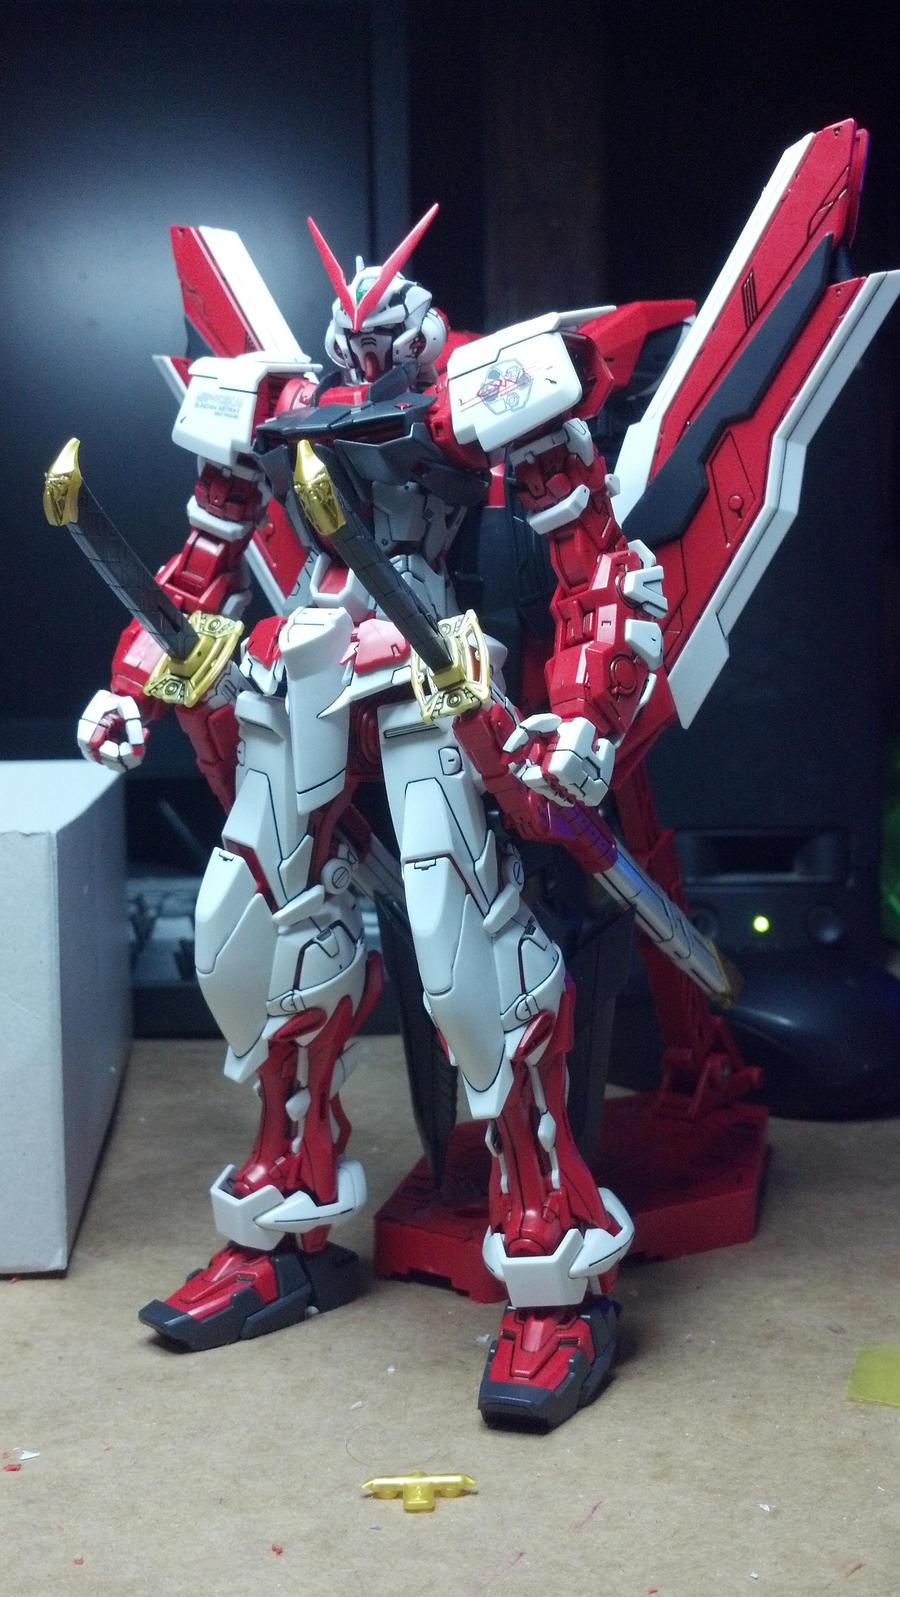 MBF-P02 Astray Red Frame Kai MG by GeneralMechanics